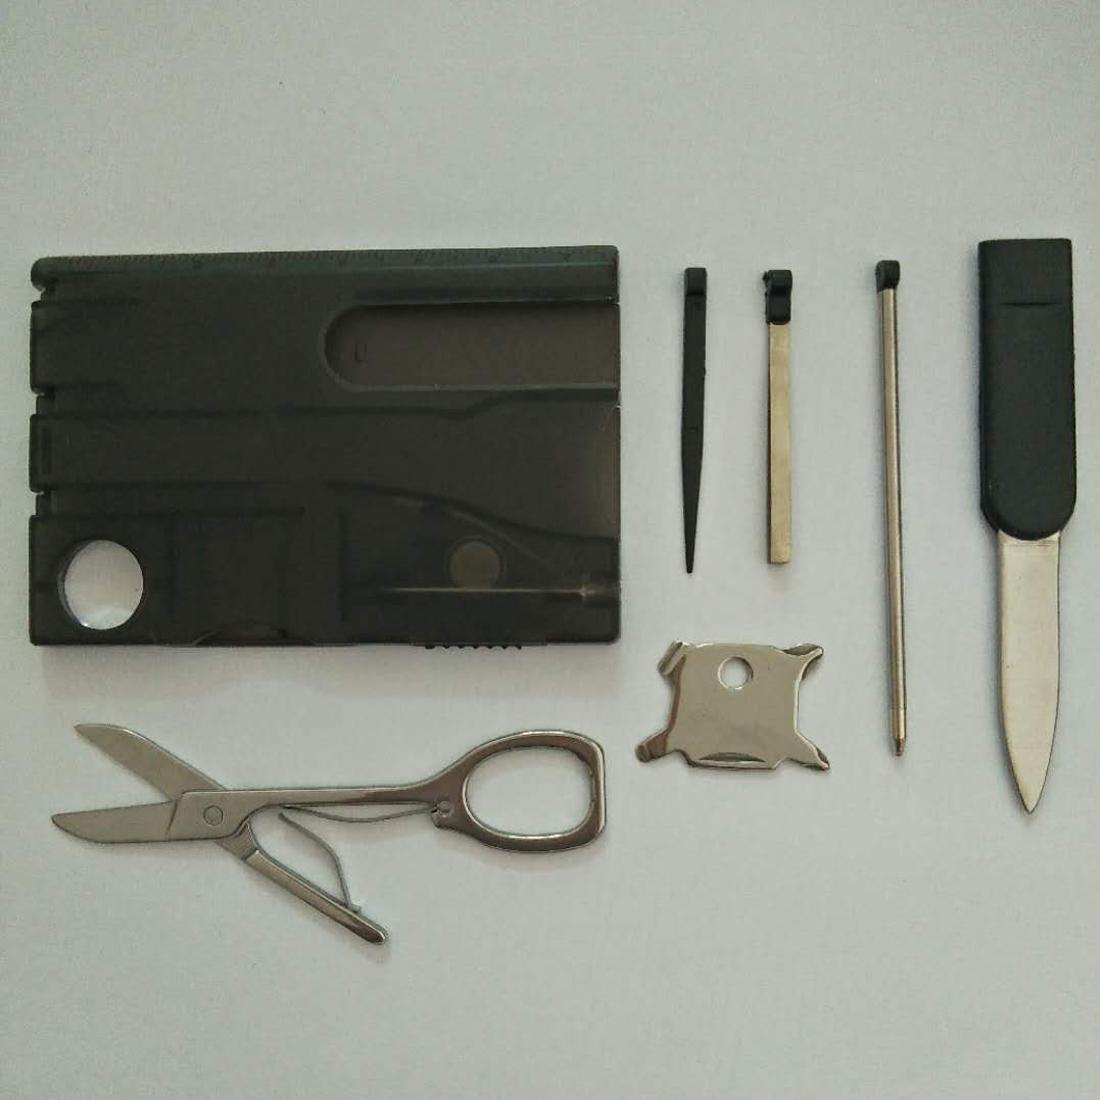 12 in 1 Card Camping Tool (1+1)